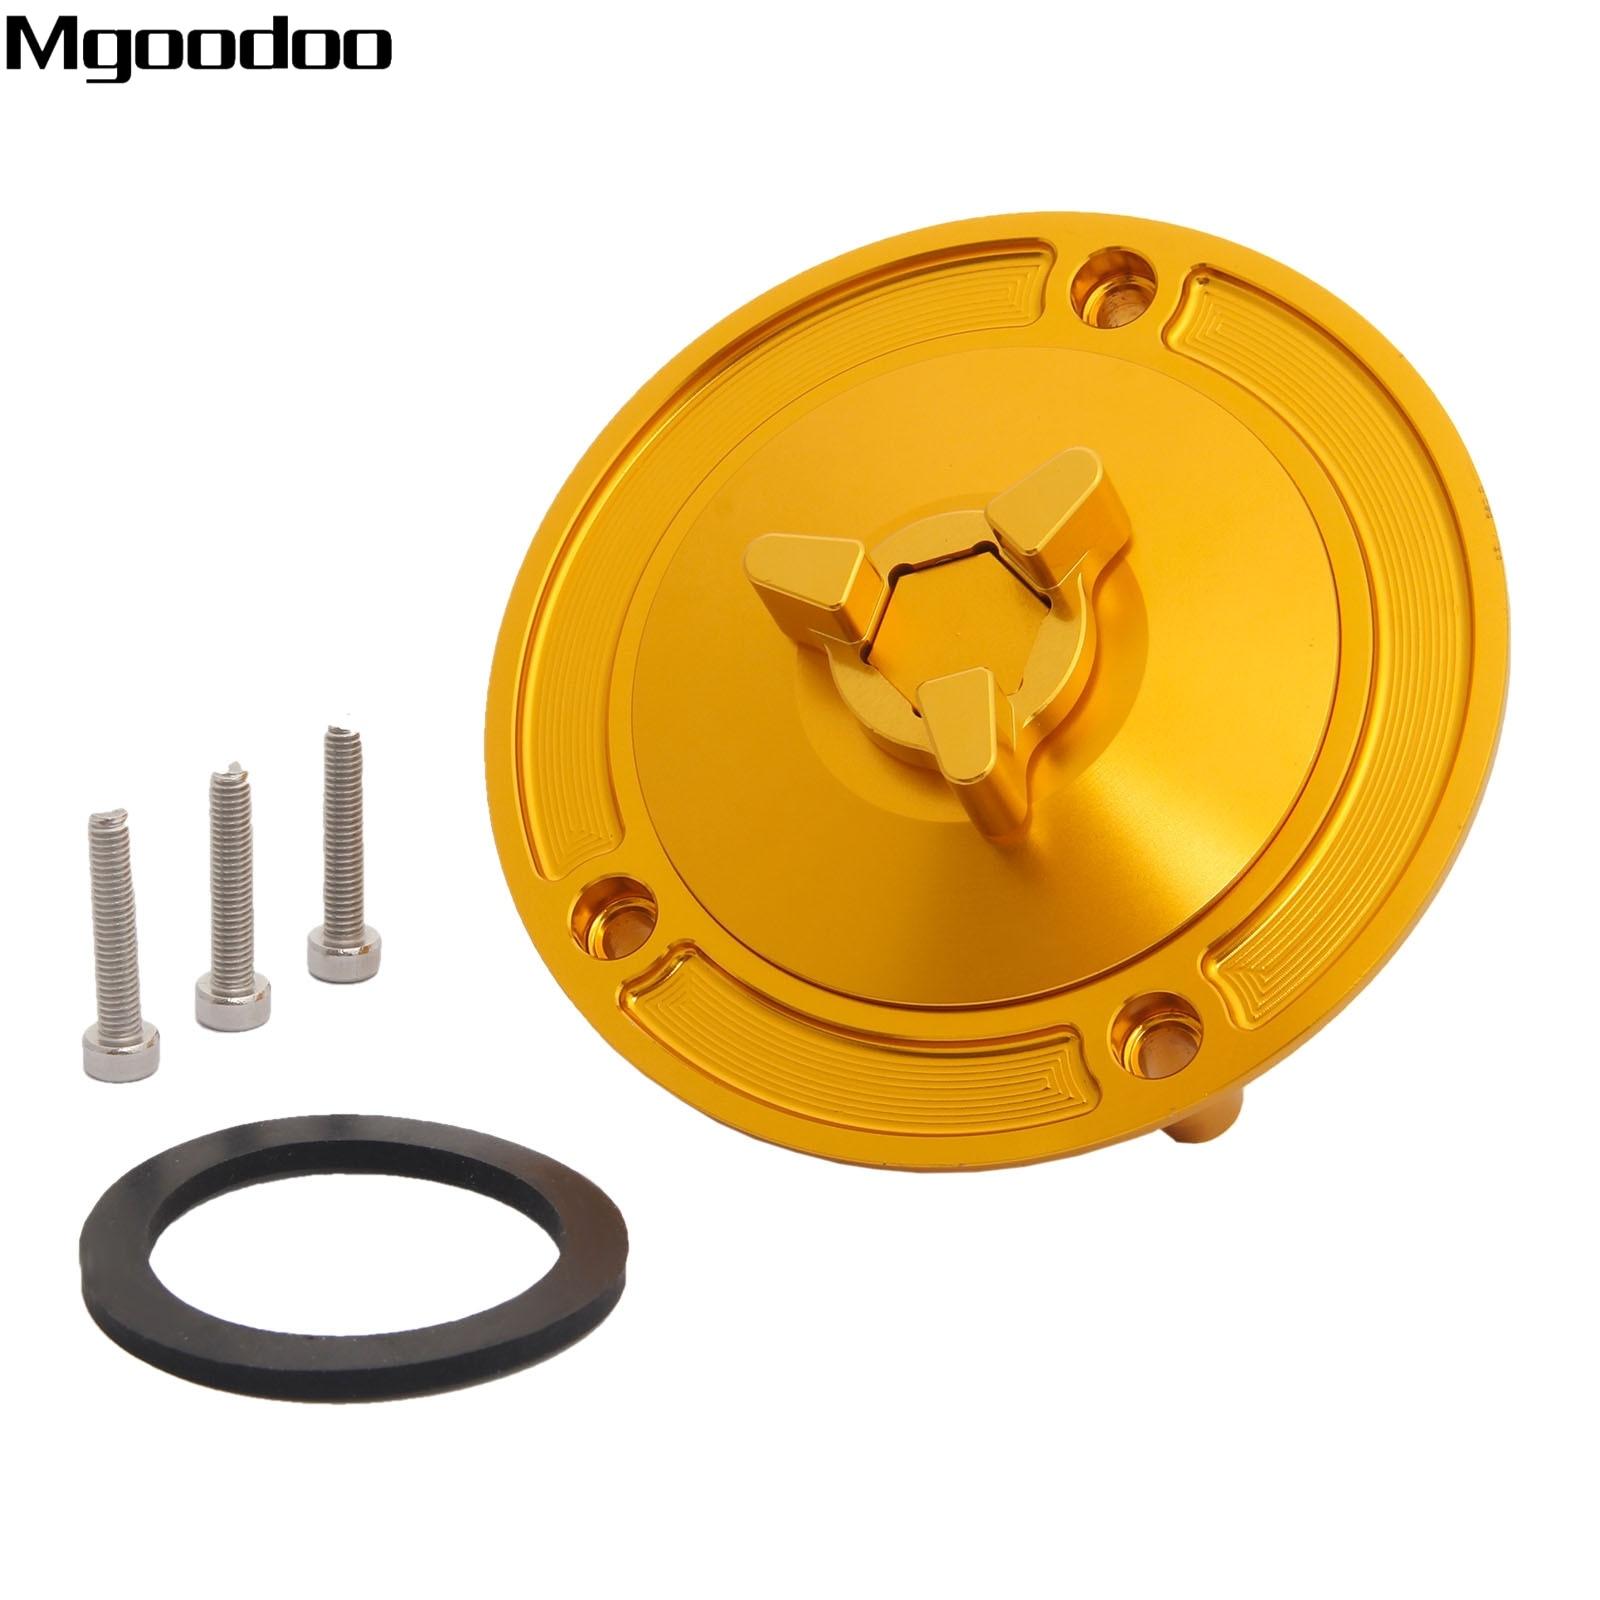 Mgoodoo New CNC Aluminum Fuel Tank Gas Cap Cover For Suzuki GSXR 600 750 1000 GSXR 1300 Hayabusa SV650/SV650S SV1000/SV1000S magnetic oil drain sump plug m14 x 1 25 for suzuki gsxr 600 750 1000